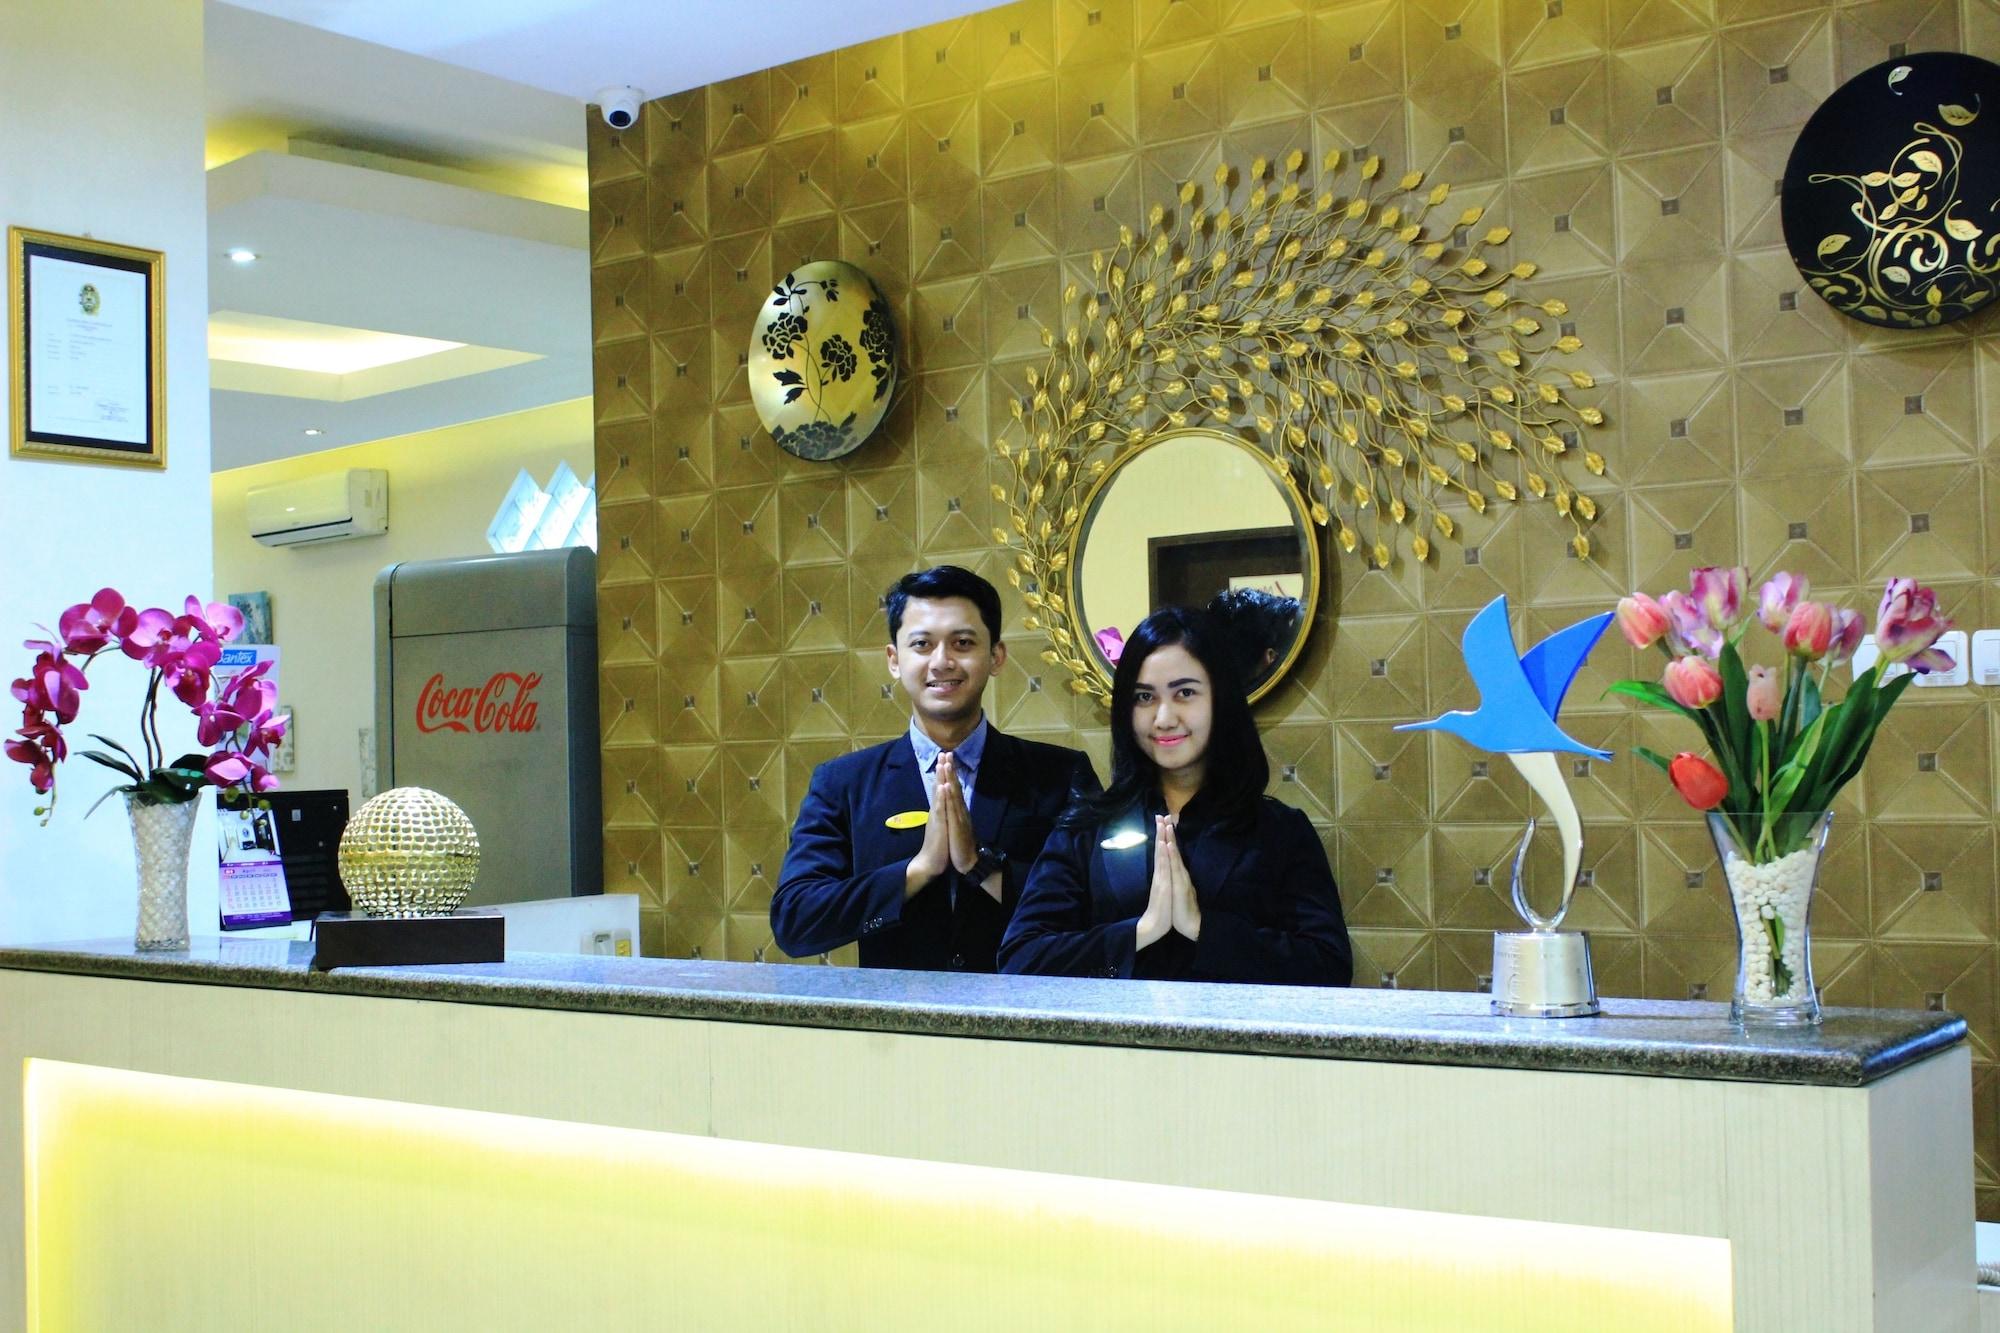 Laxston Hotel by Front One, Yogyakarta